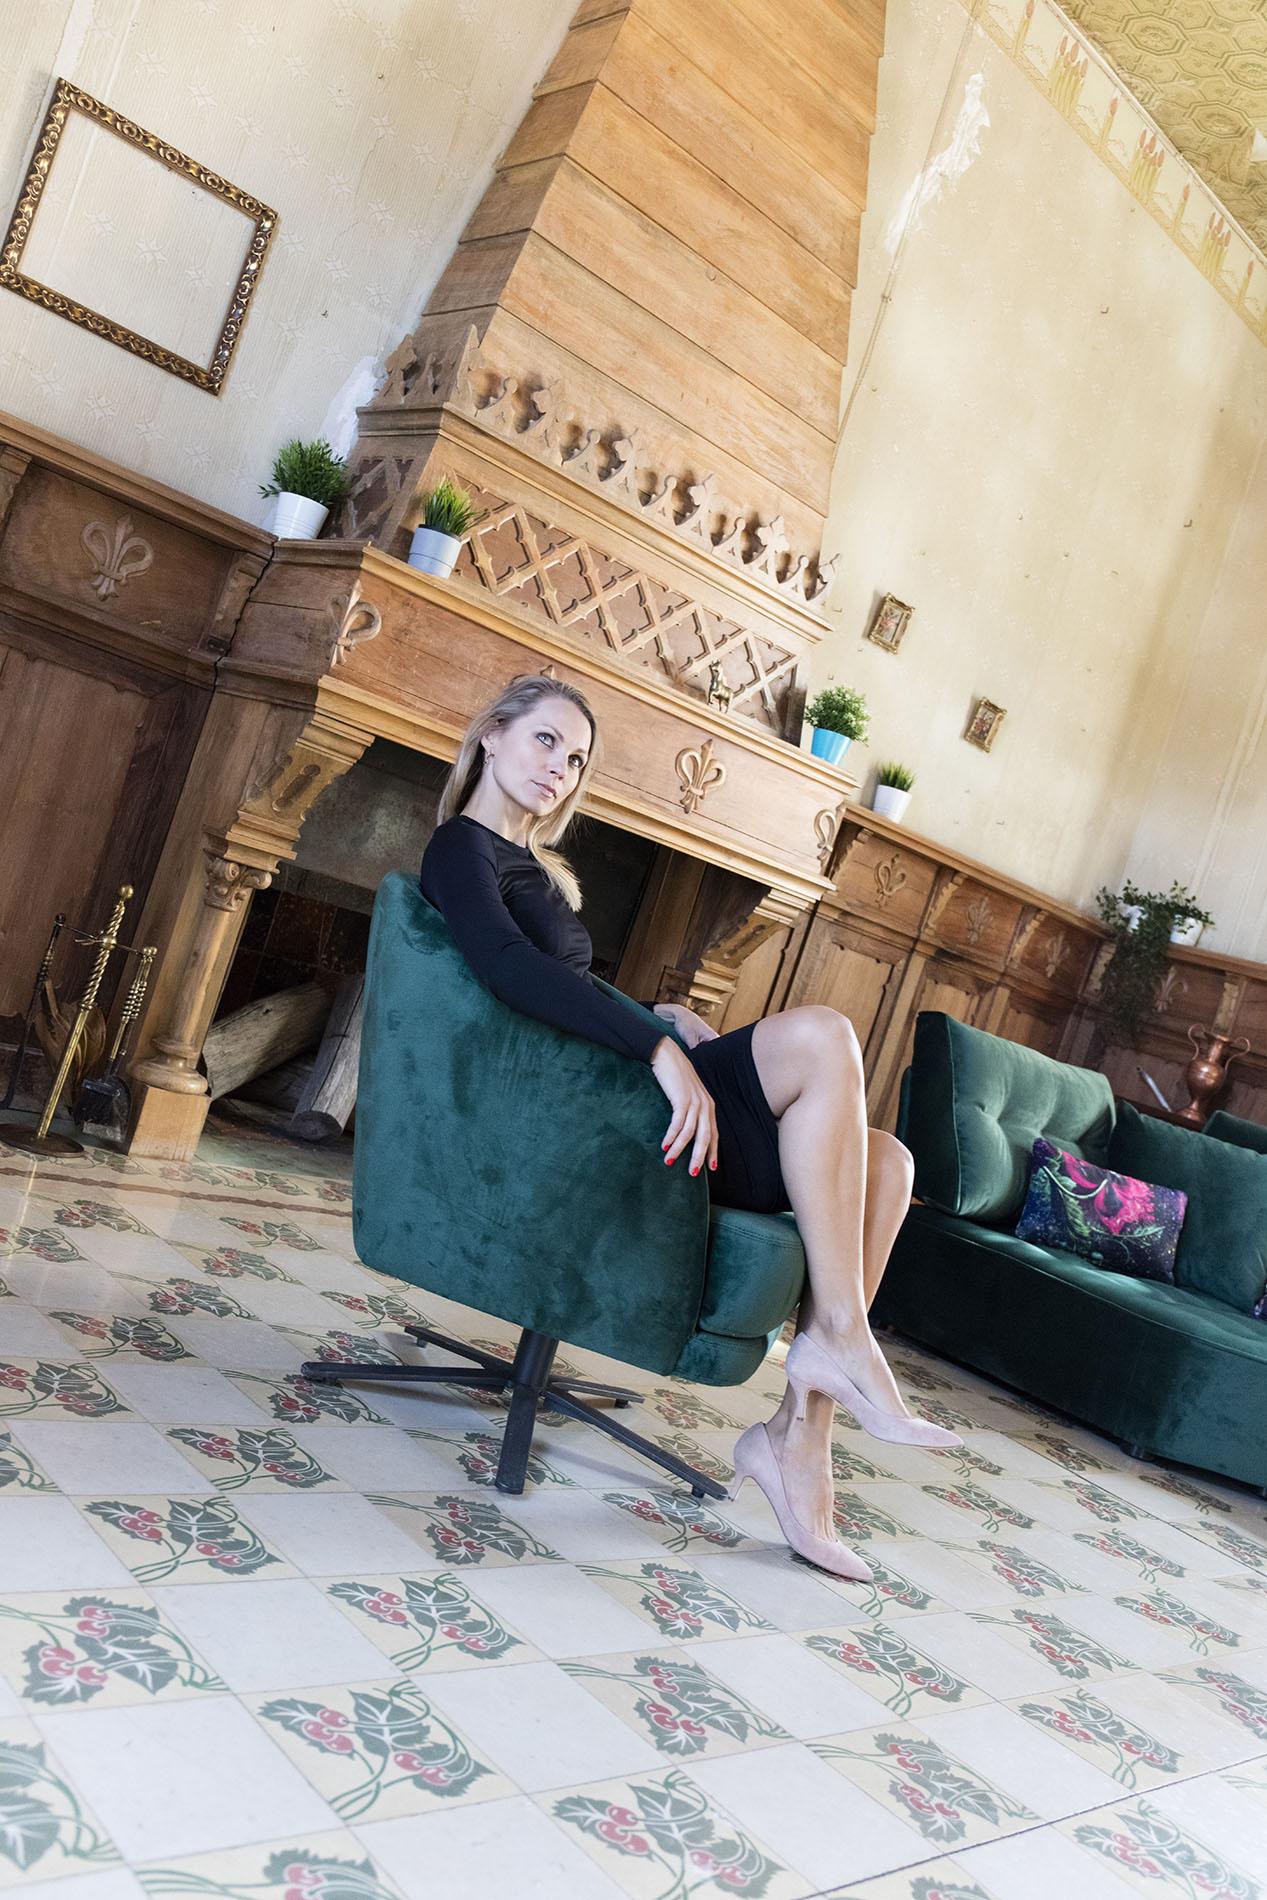 swing chair petrol color, velvet green armchair that turns around, karekla peristrefomeni prasini me mavra podia,